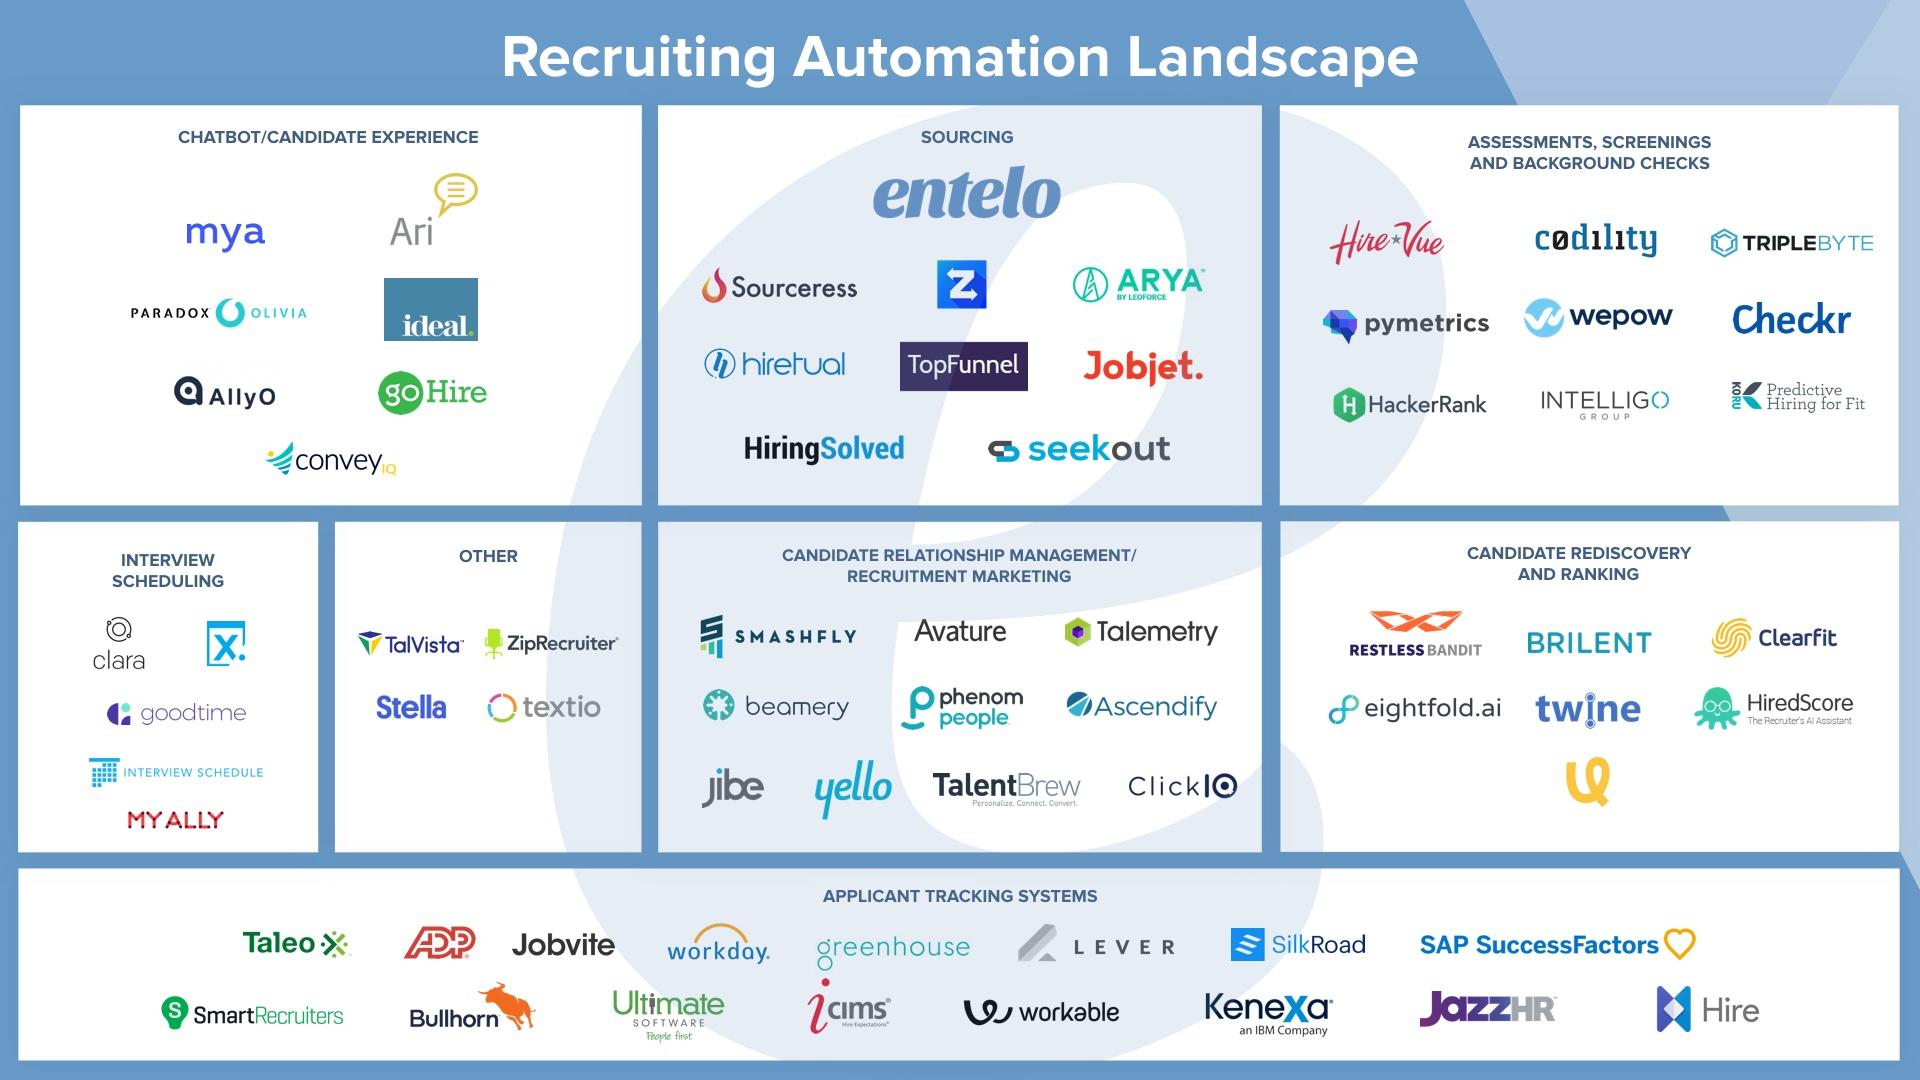 Recruiting Automation Landscape Image